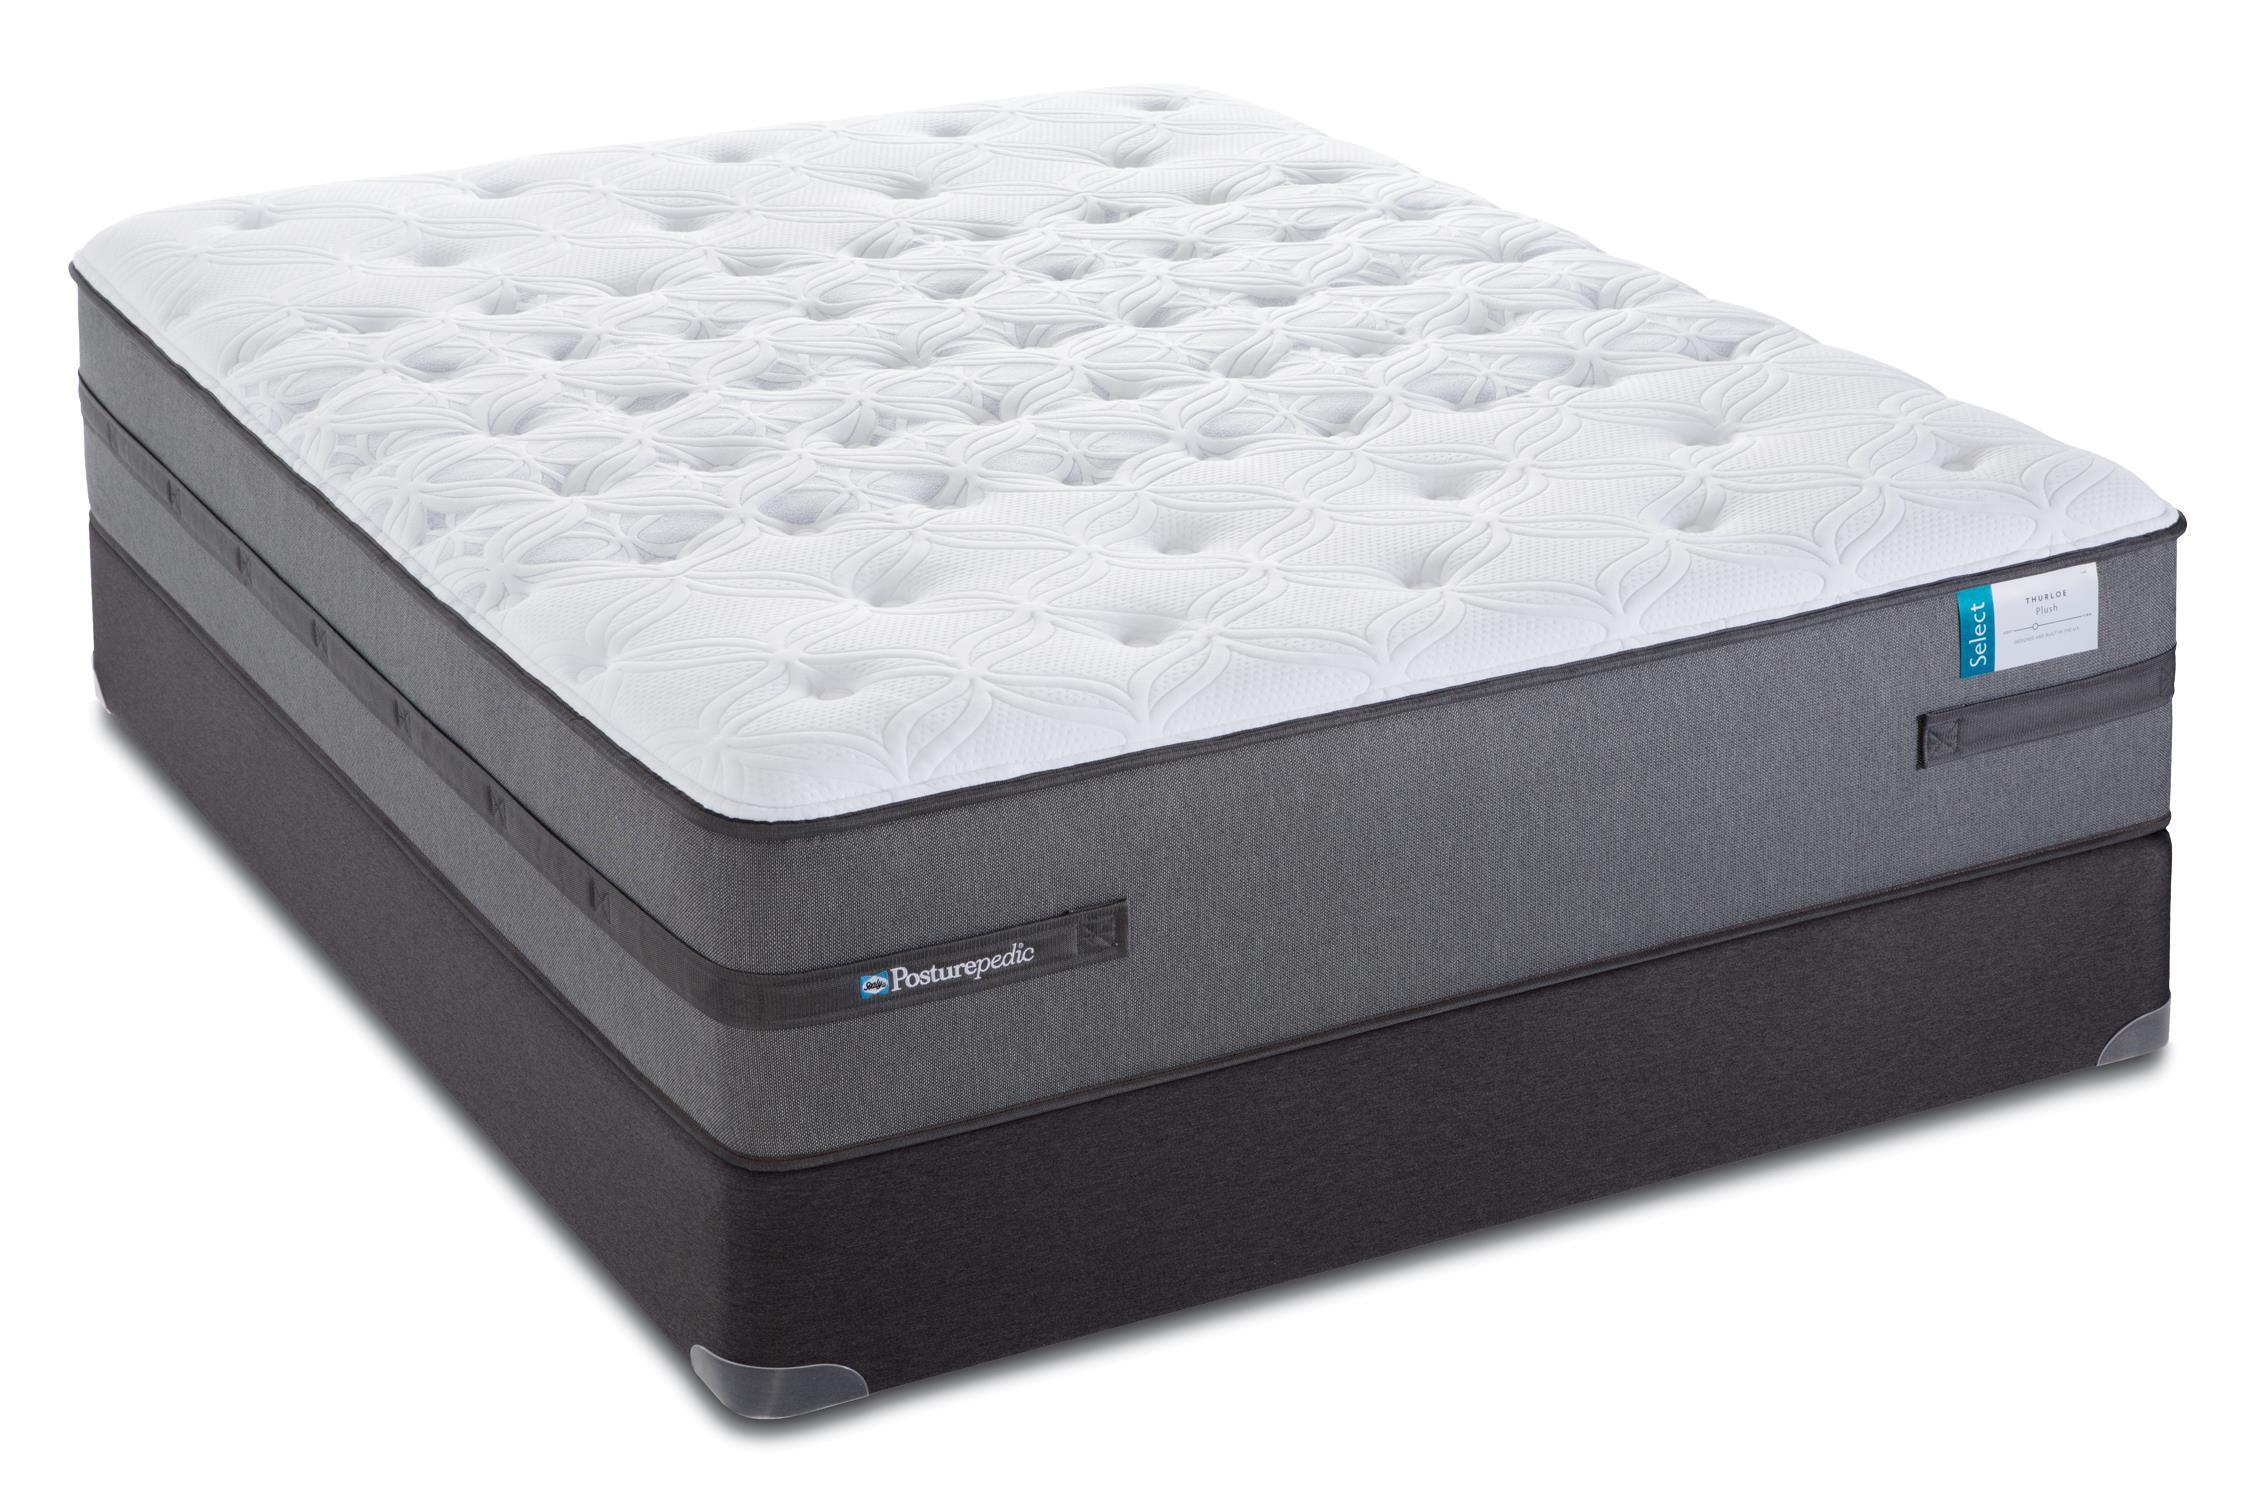 Sealy Posturepedic Select Q4 Queen Cushion Firm Mattress Set - Item Number: CushionFirmTT-Q+SSfoundation-Q